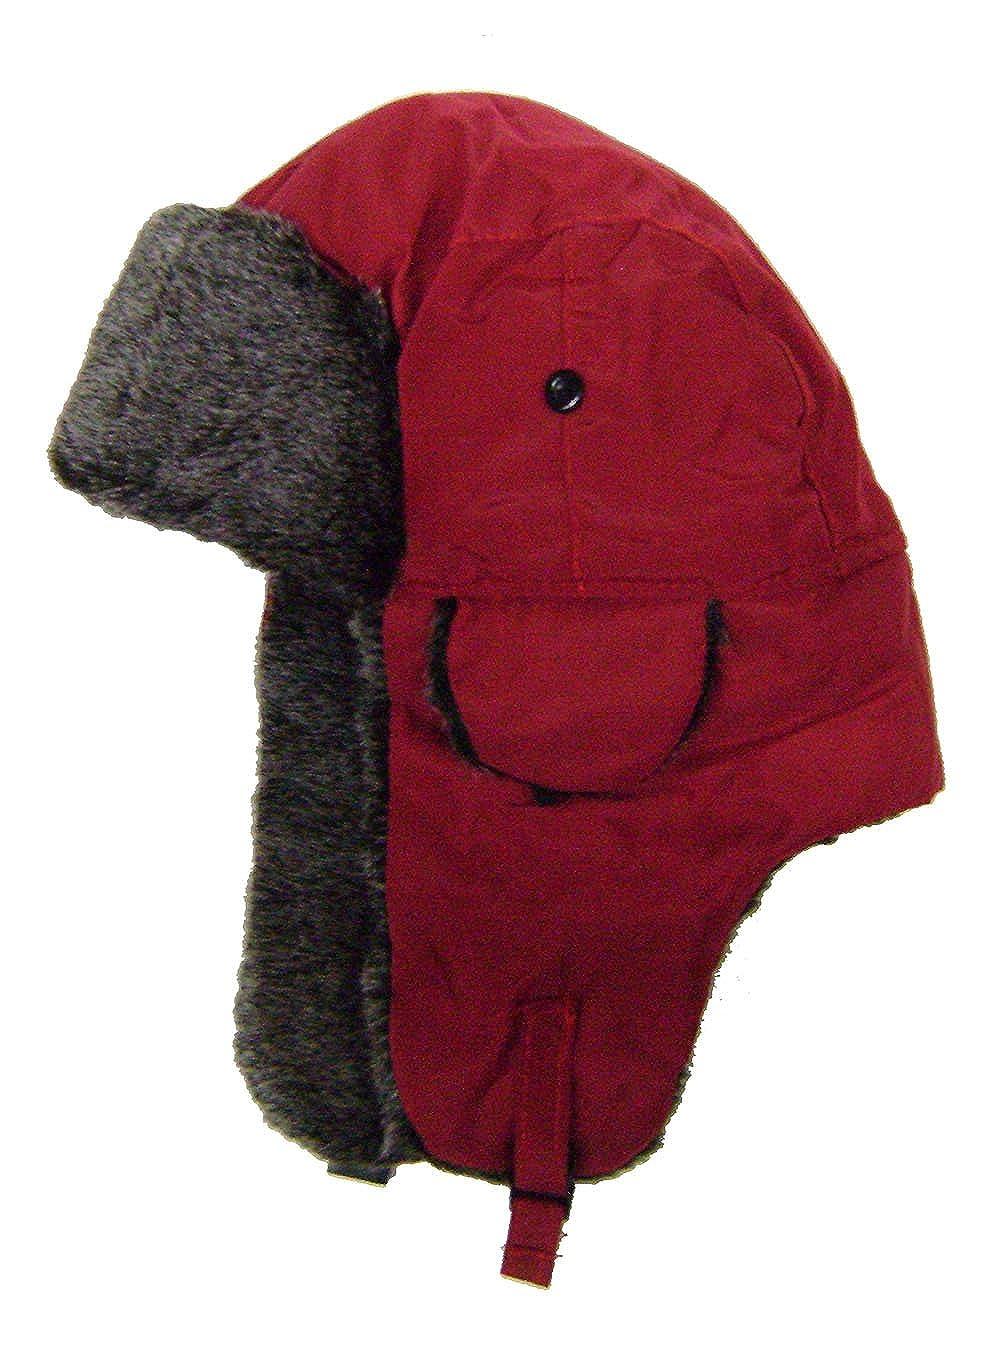 Modestone Warm Trapper Bomber Hat Faux Fur Trim o//s Red